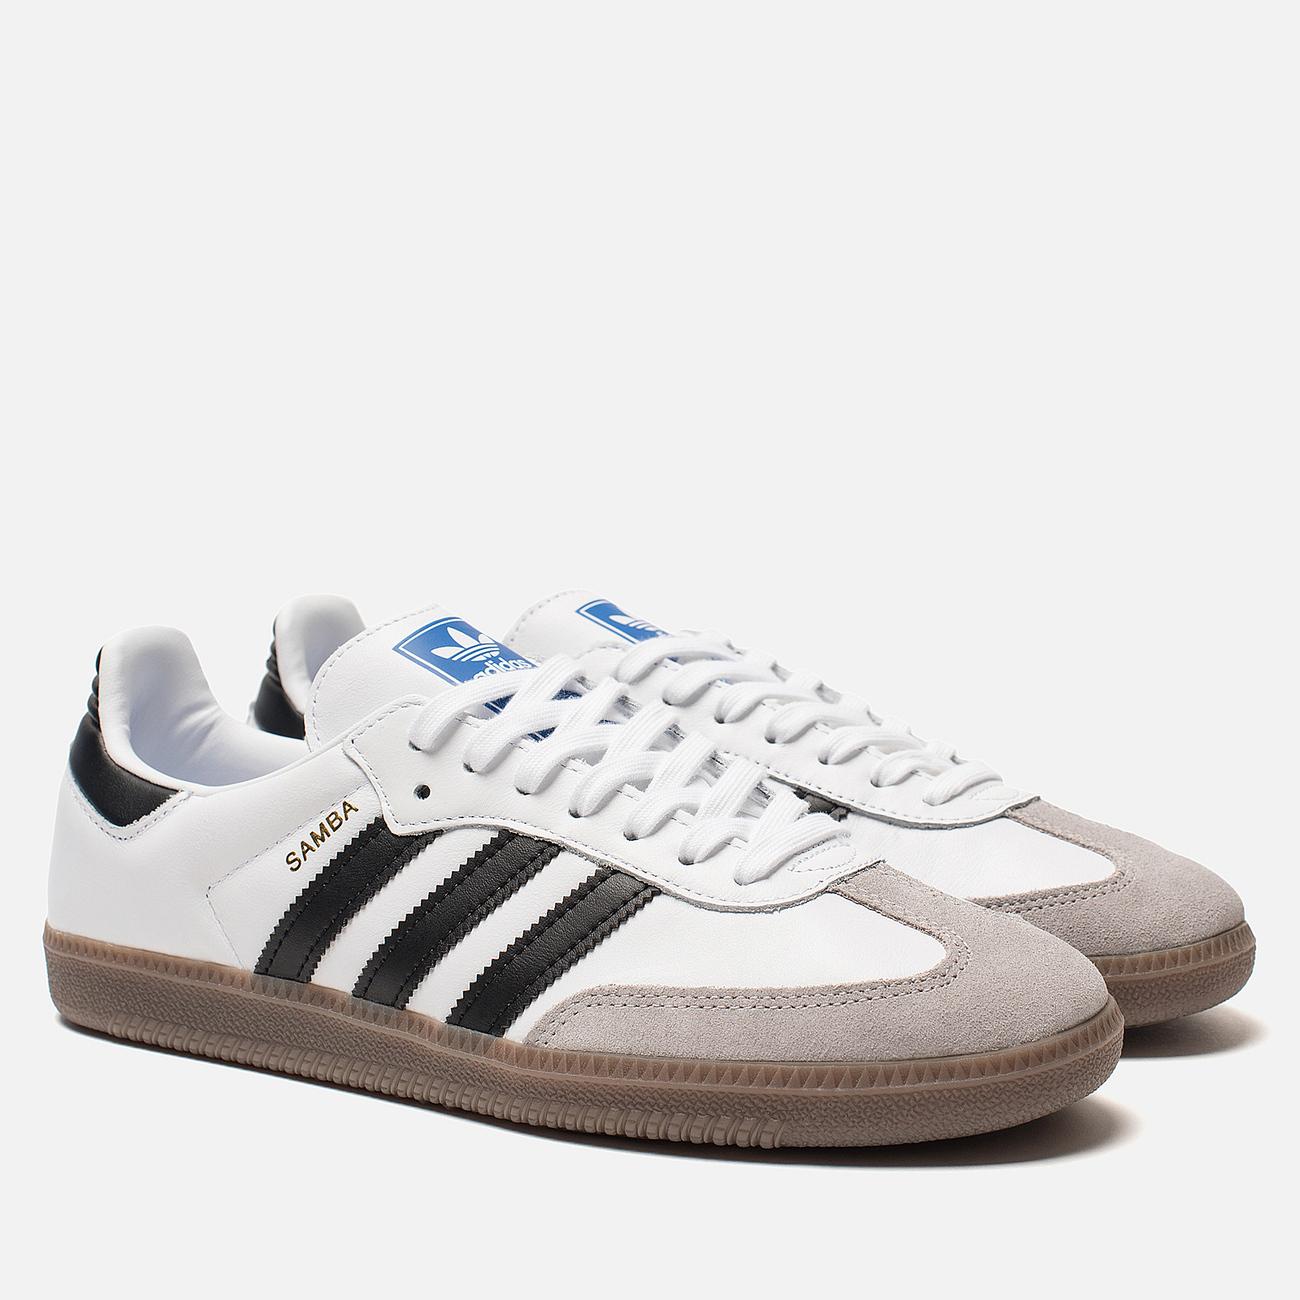 Кроссовки adidas Originals Samba OG White/Black/Clear Granite